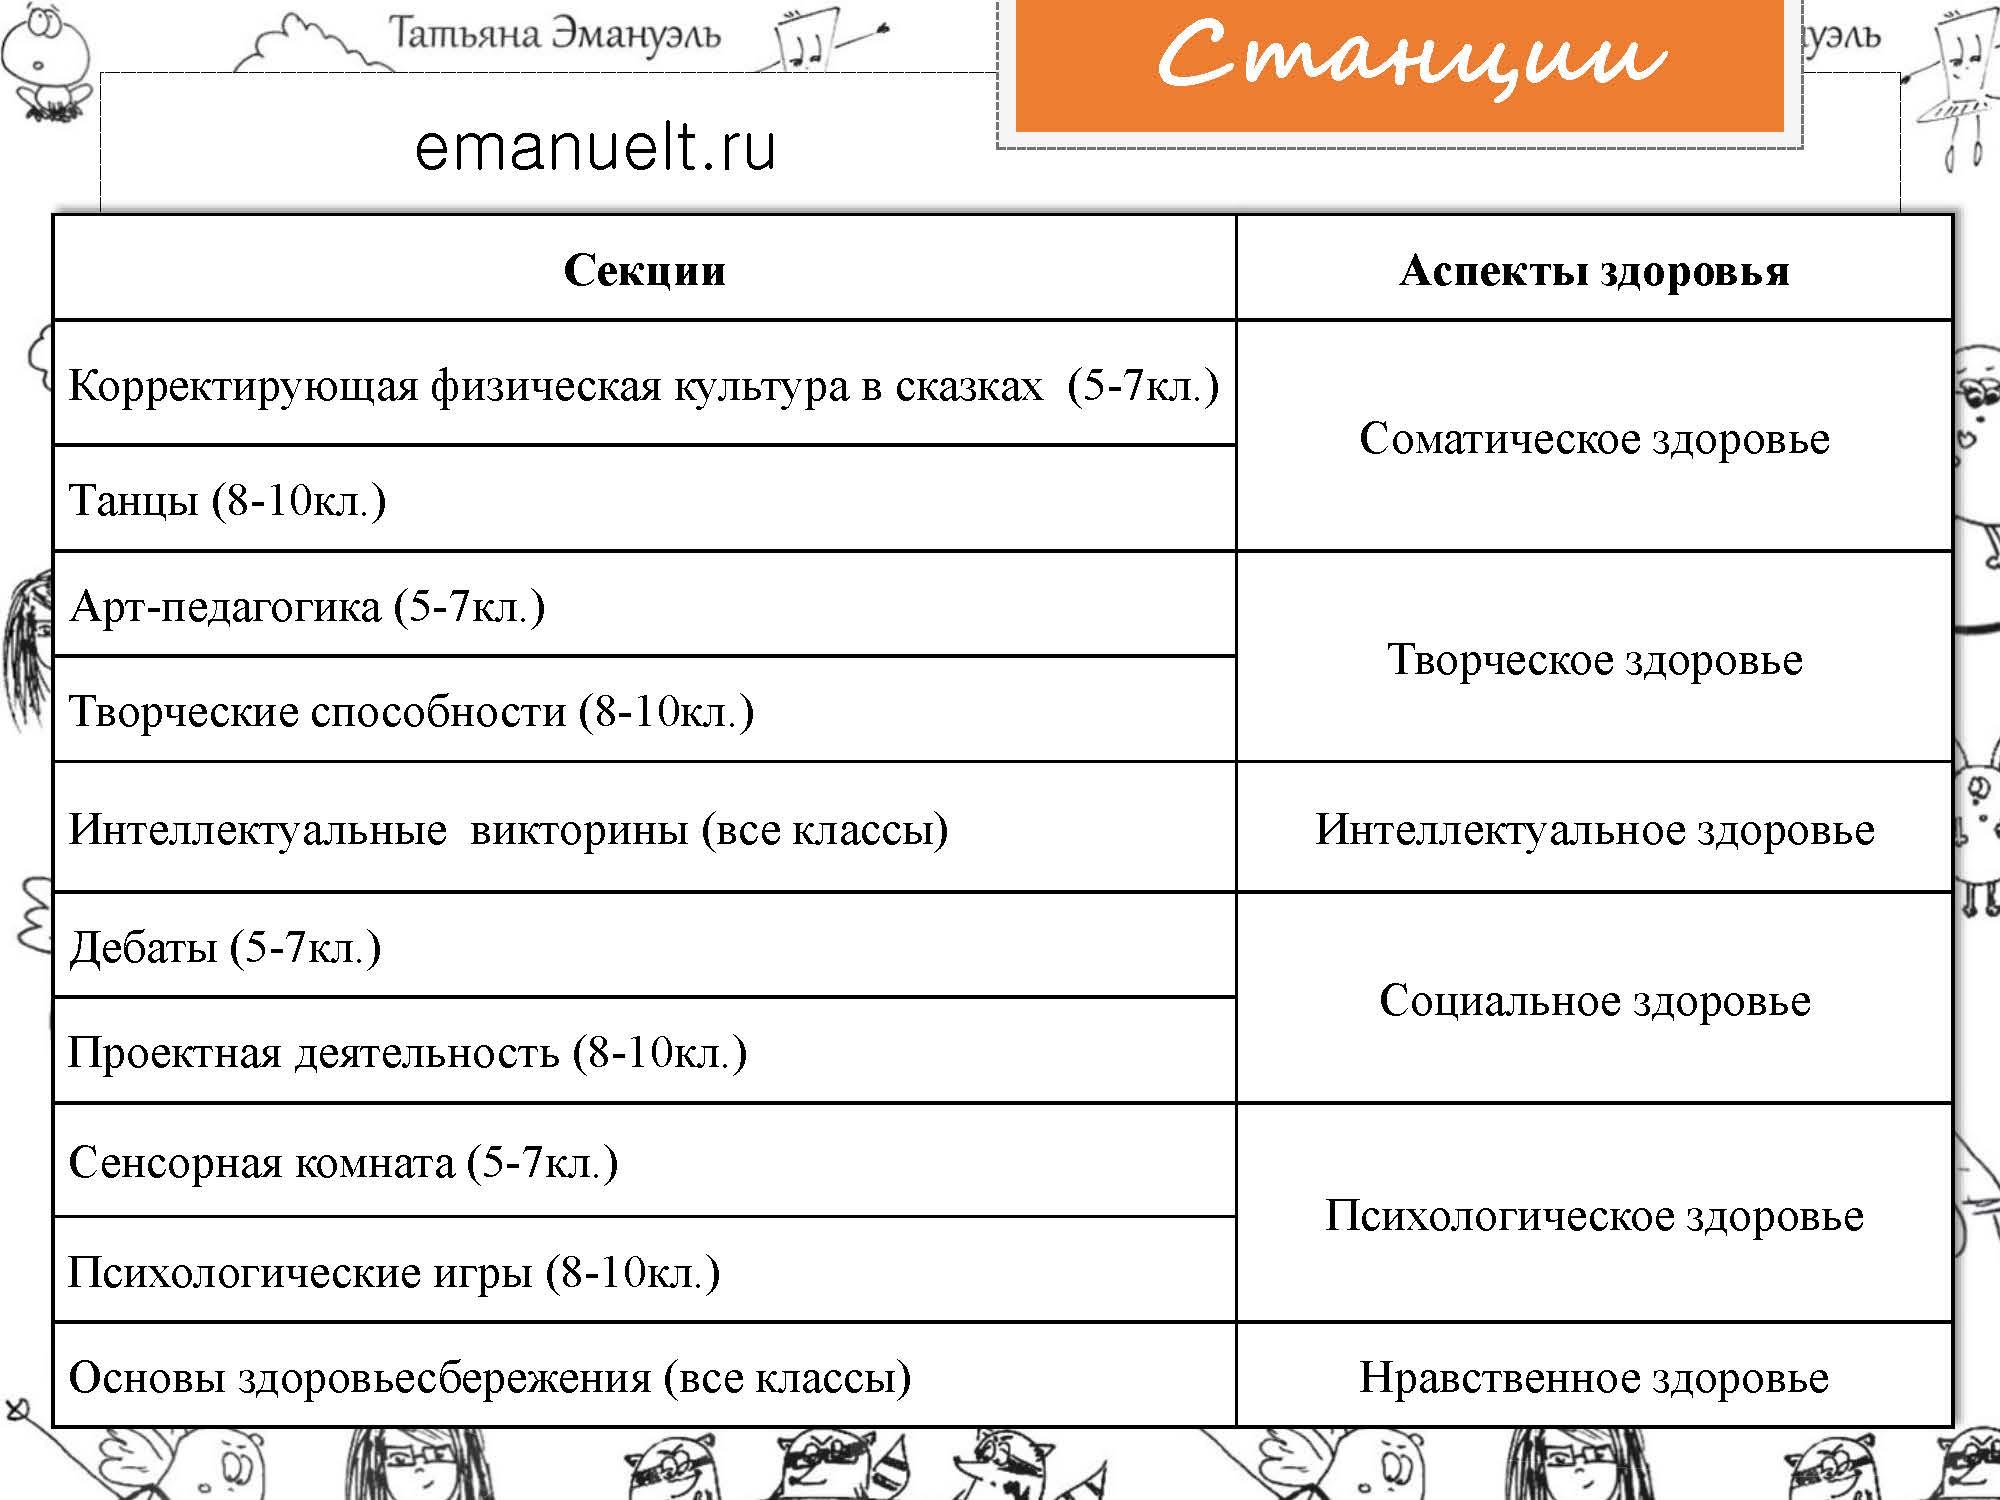 RazBeG_Emanuel_Страница_06